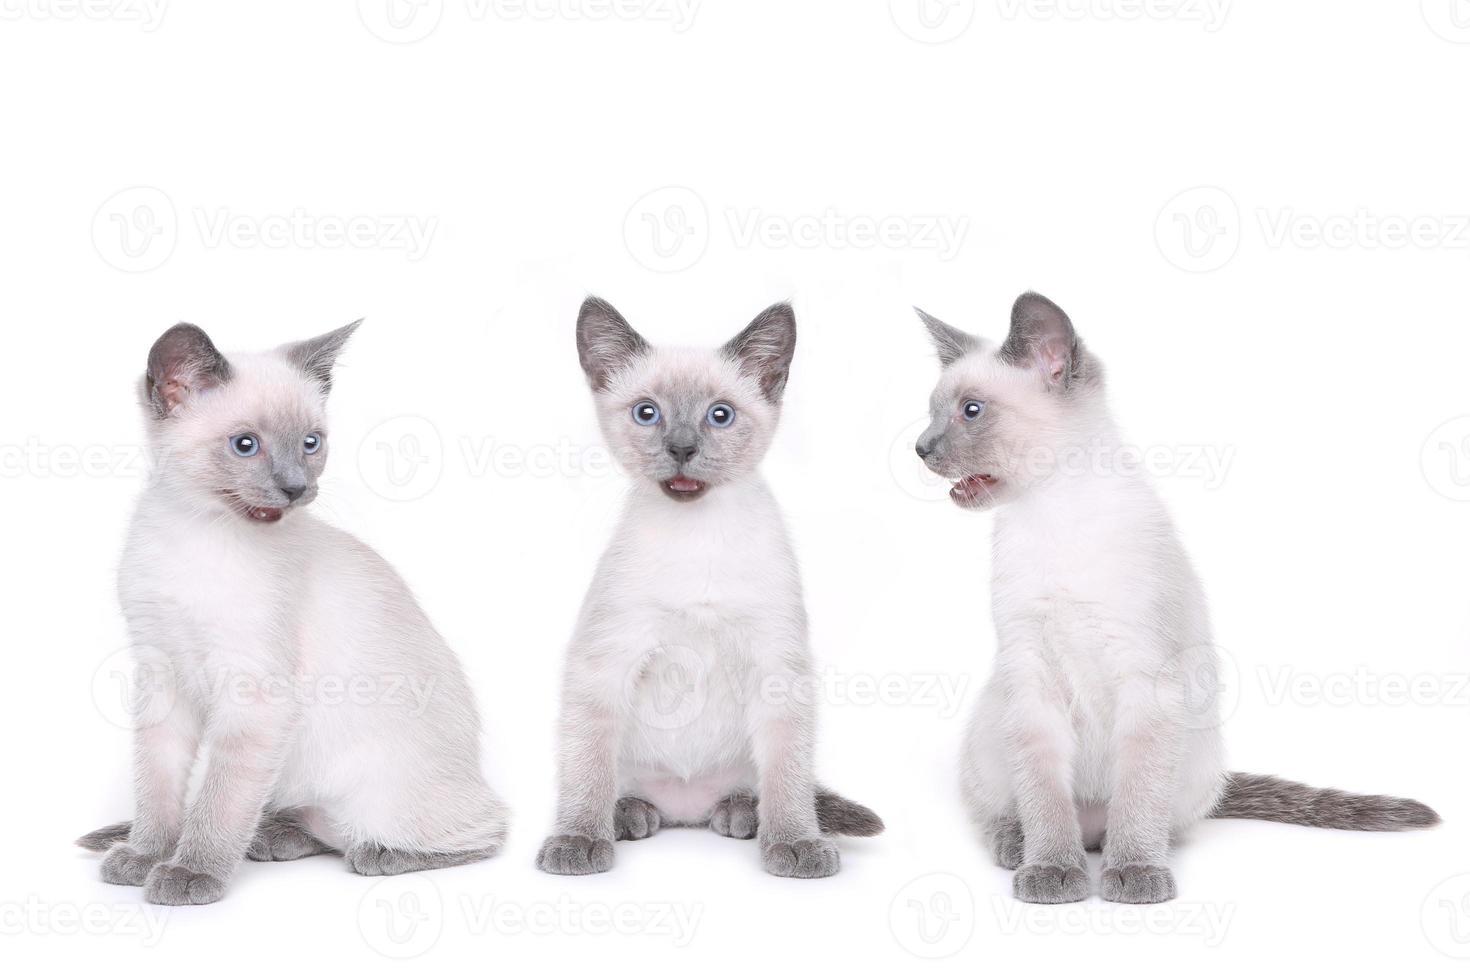 gattini siamesi su sfondo bianco foto